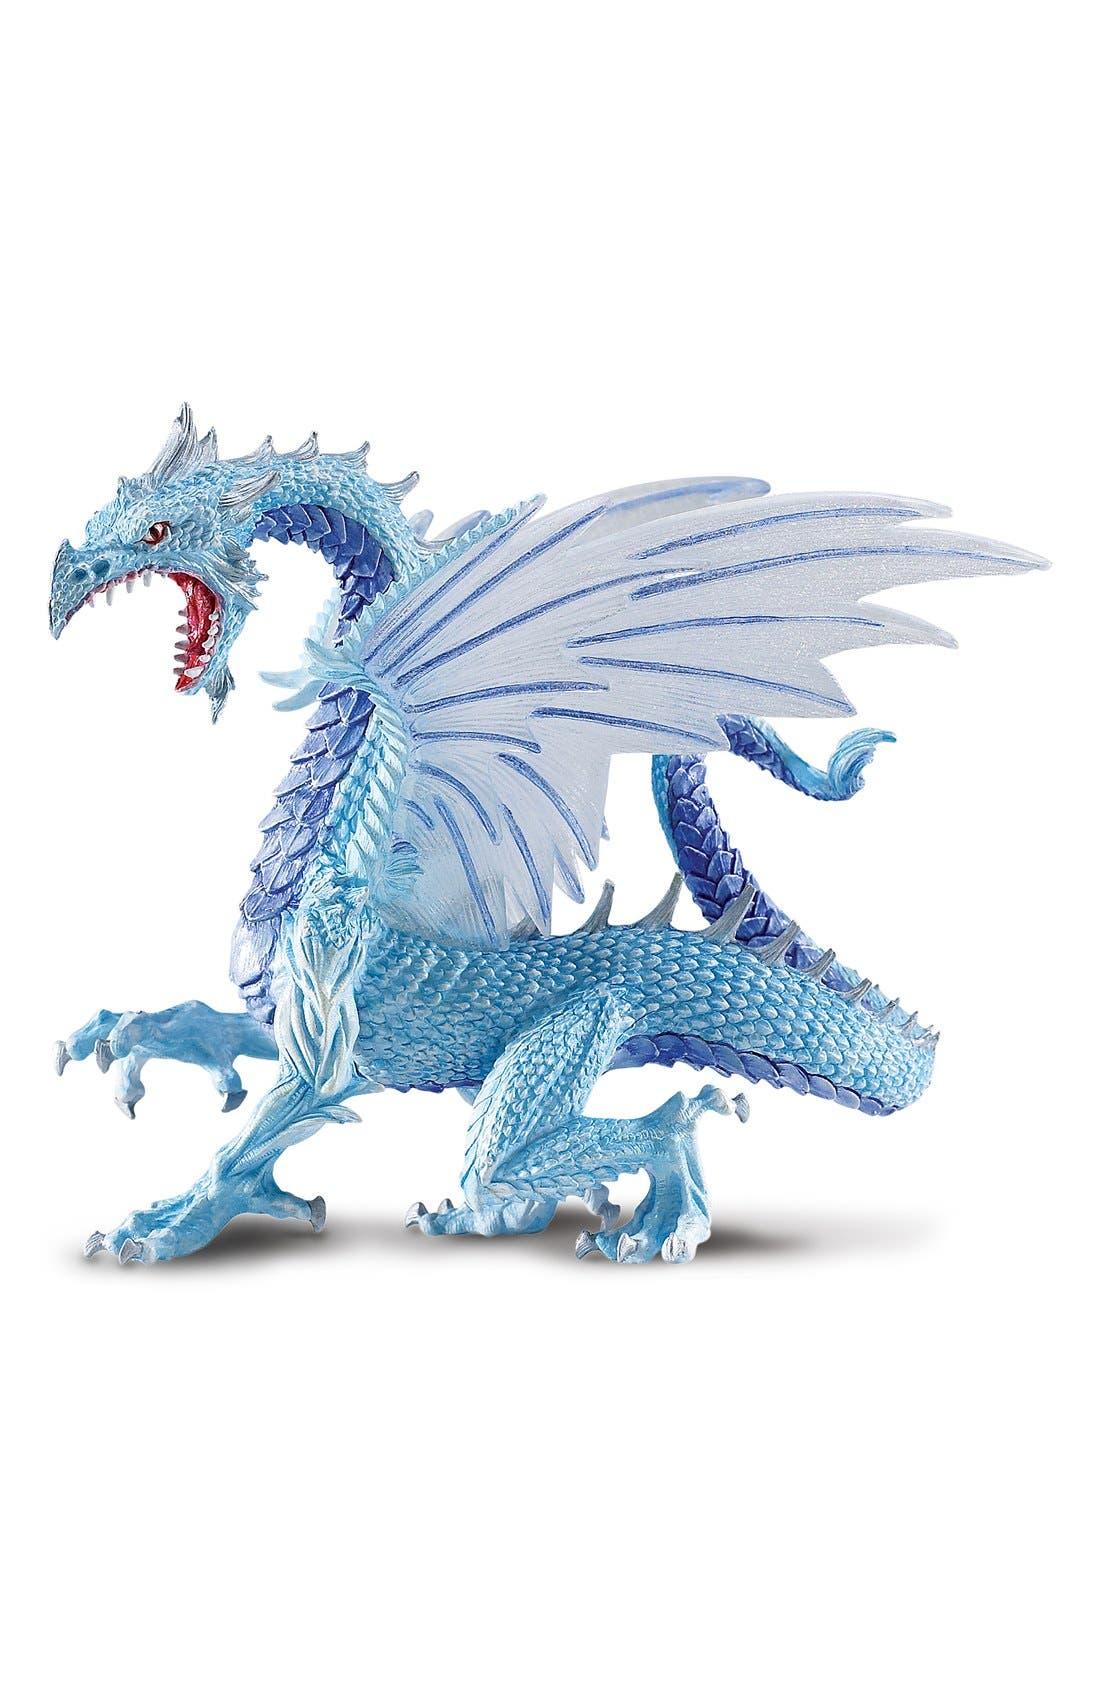 Ice Dragon Figurine,                             Main thumbnail 1, color,                             NO COLOR